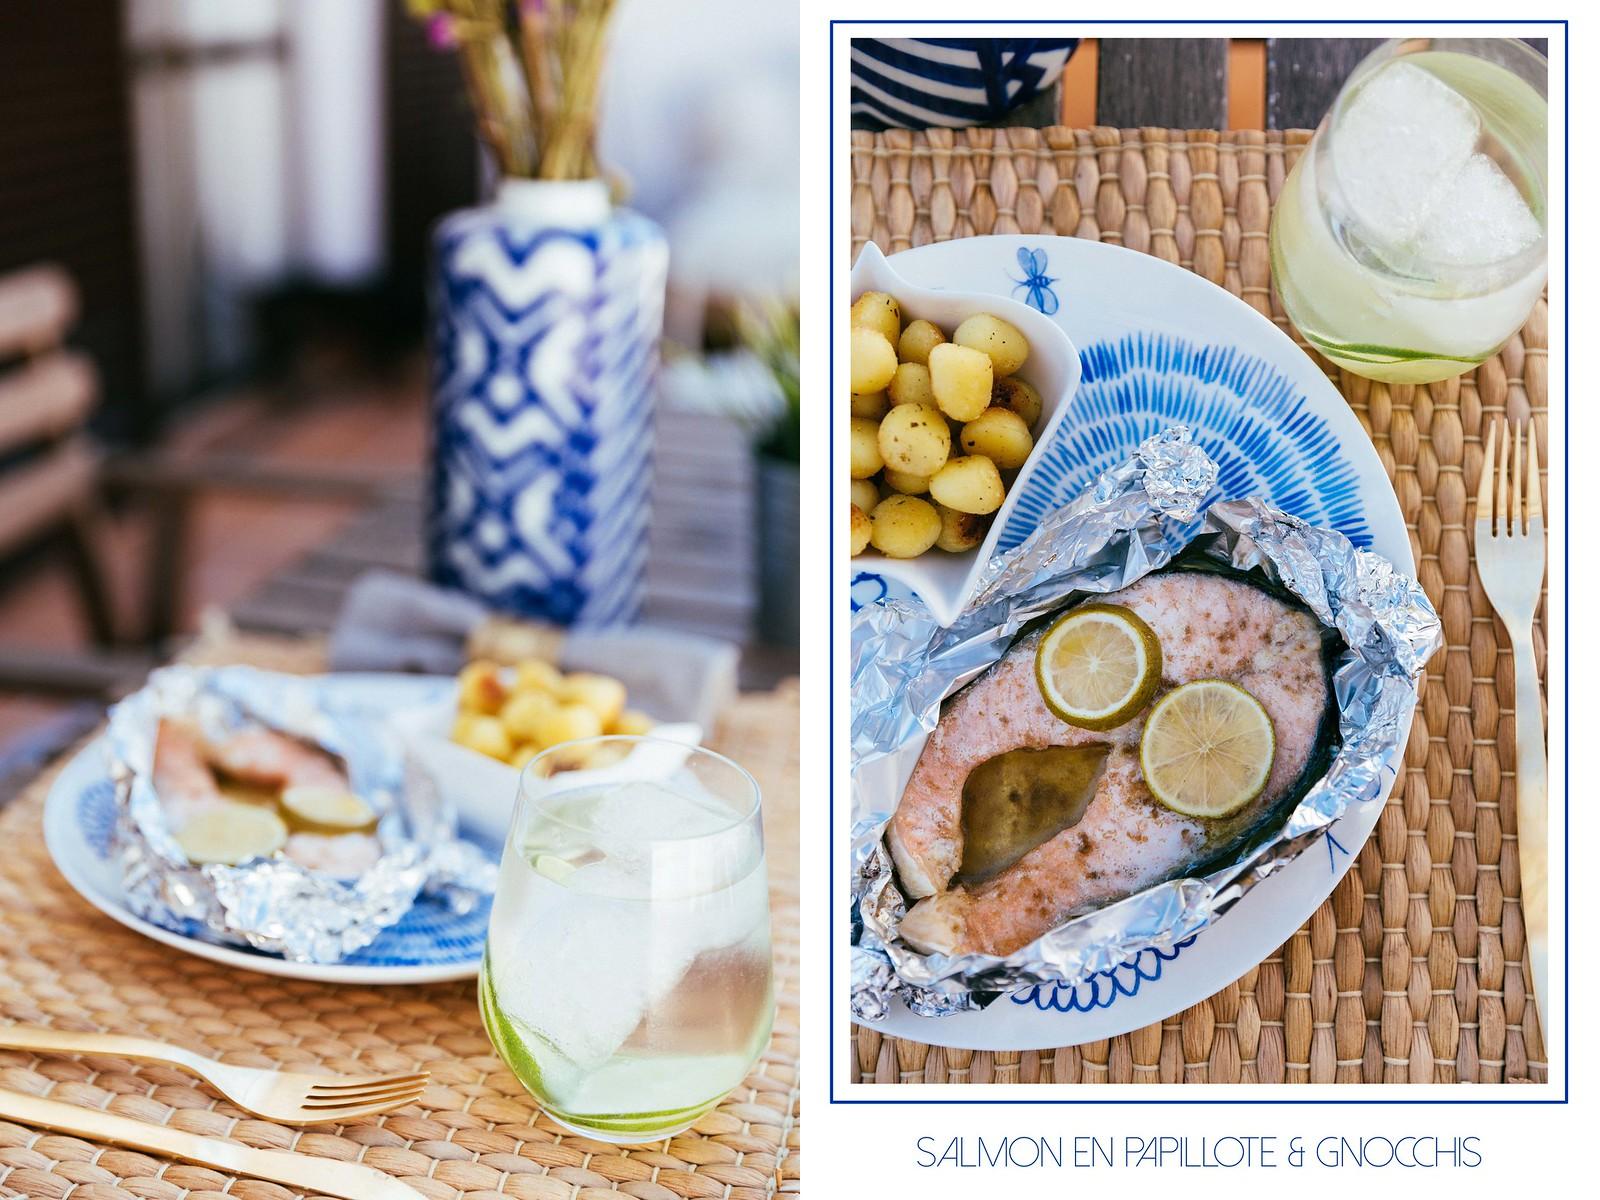 seams for a desire - jessie chanes - recetas fáciles - salmon en papillote-1